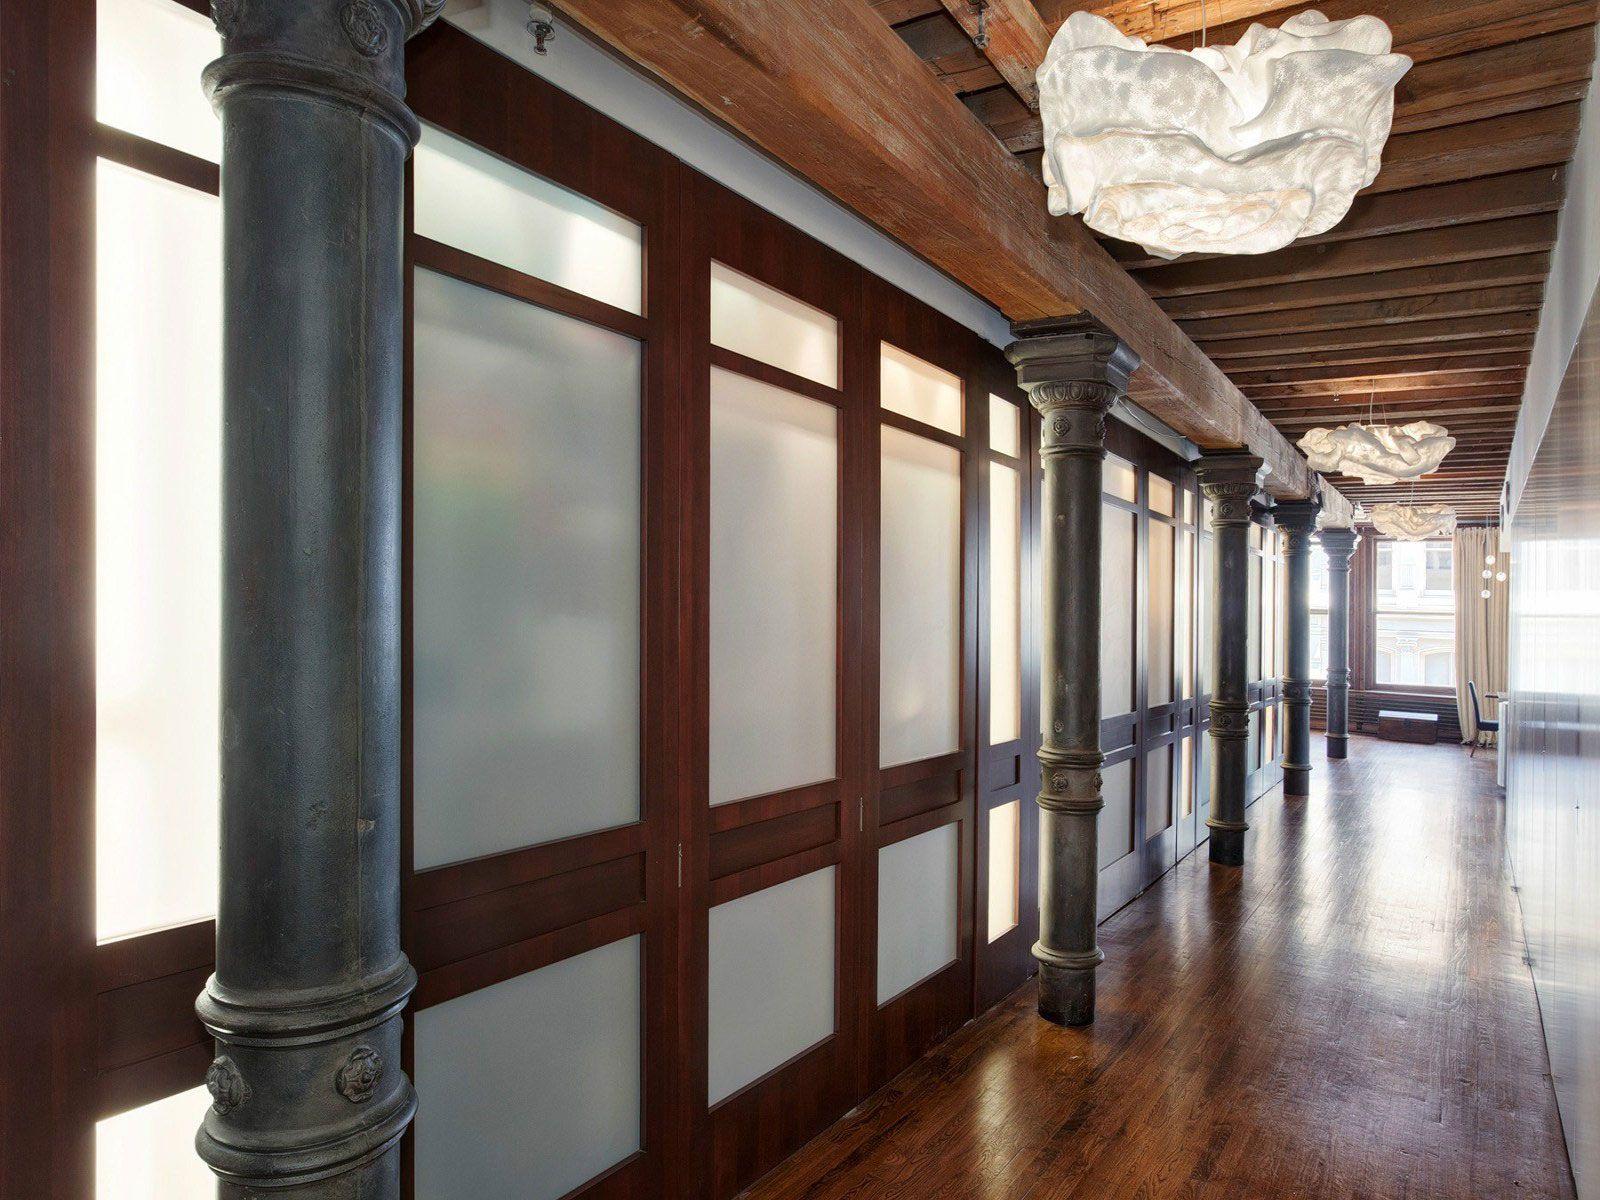 Ultimate Soho Exposed Brick and Wood Beams Loft on Prince Street in New York-02